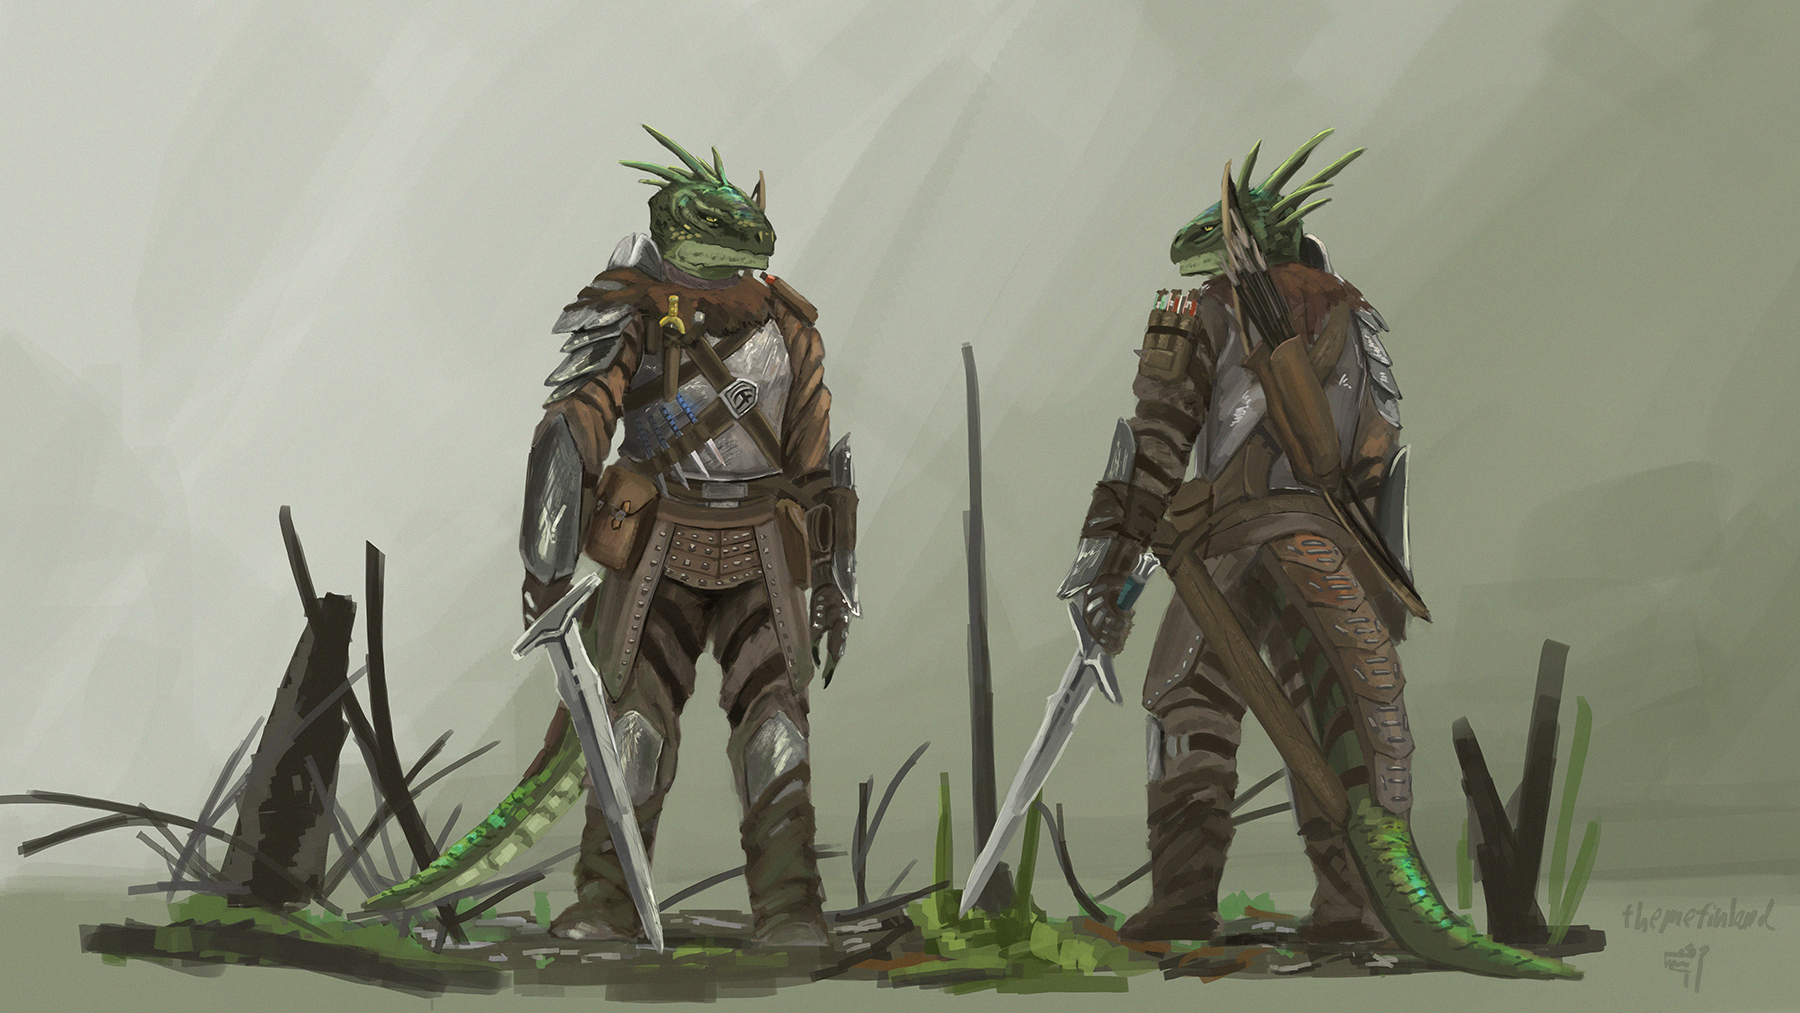 Prowling knight